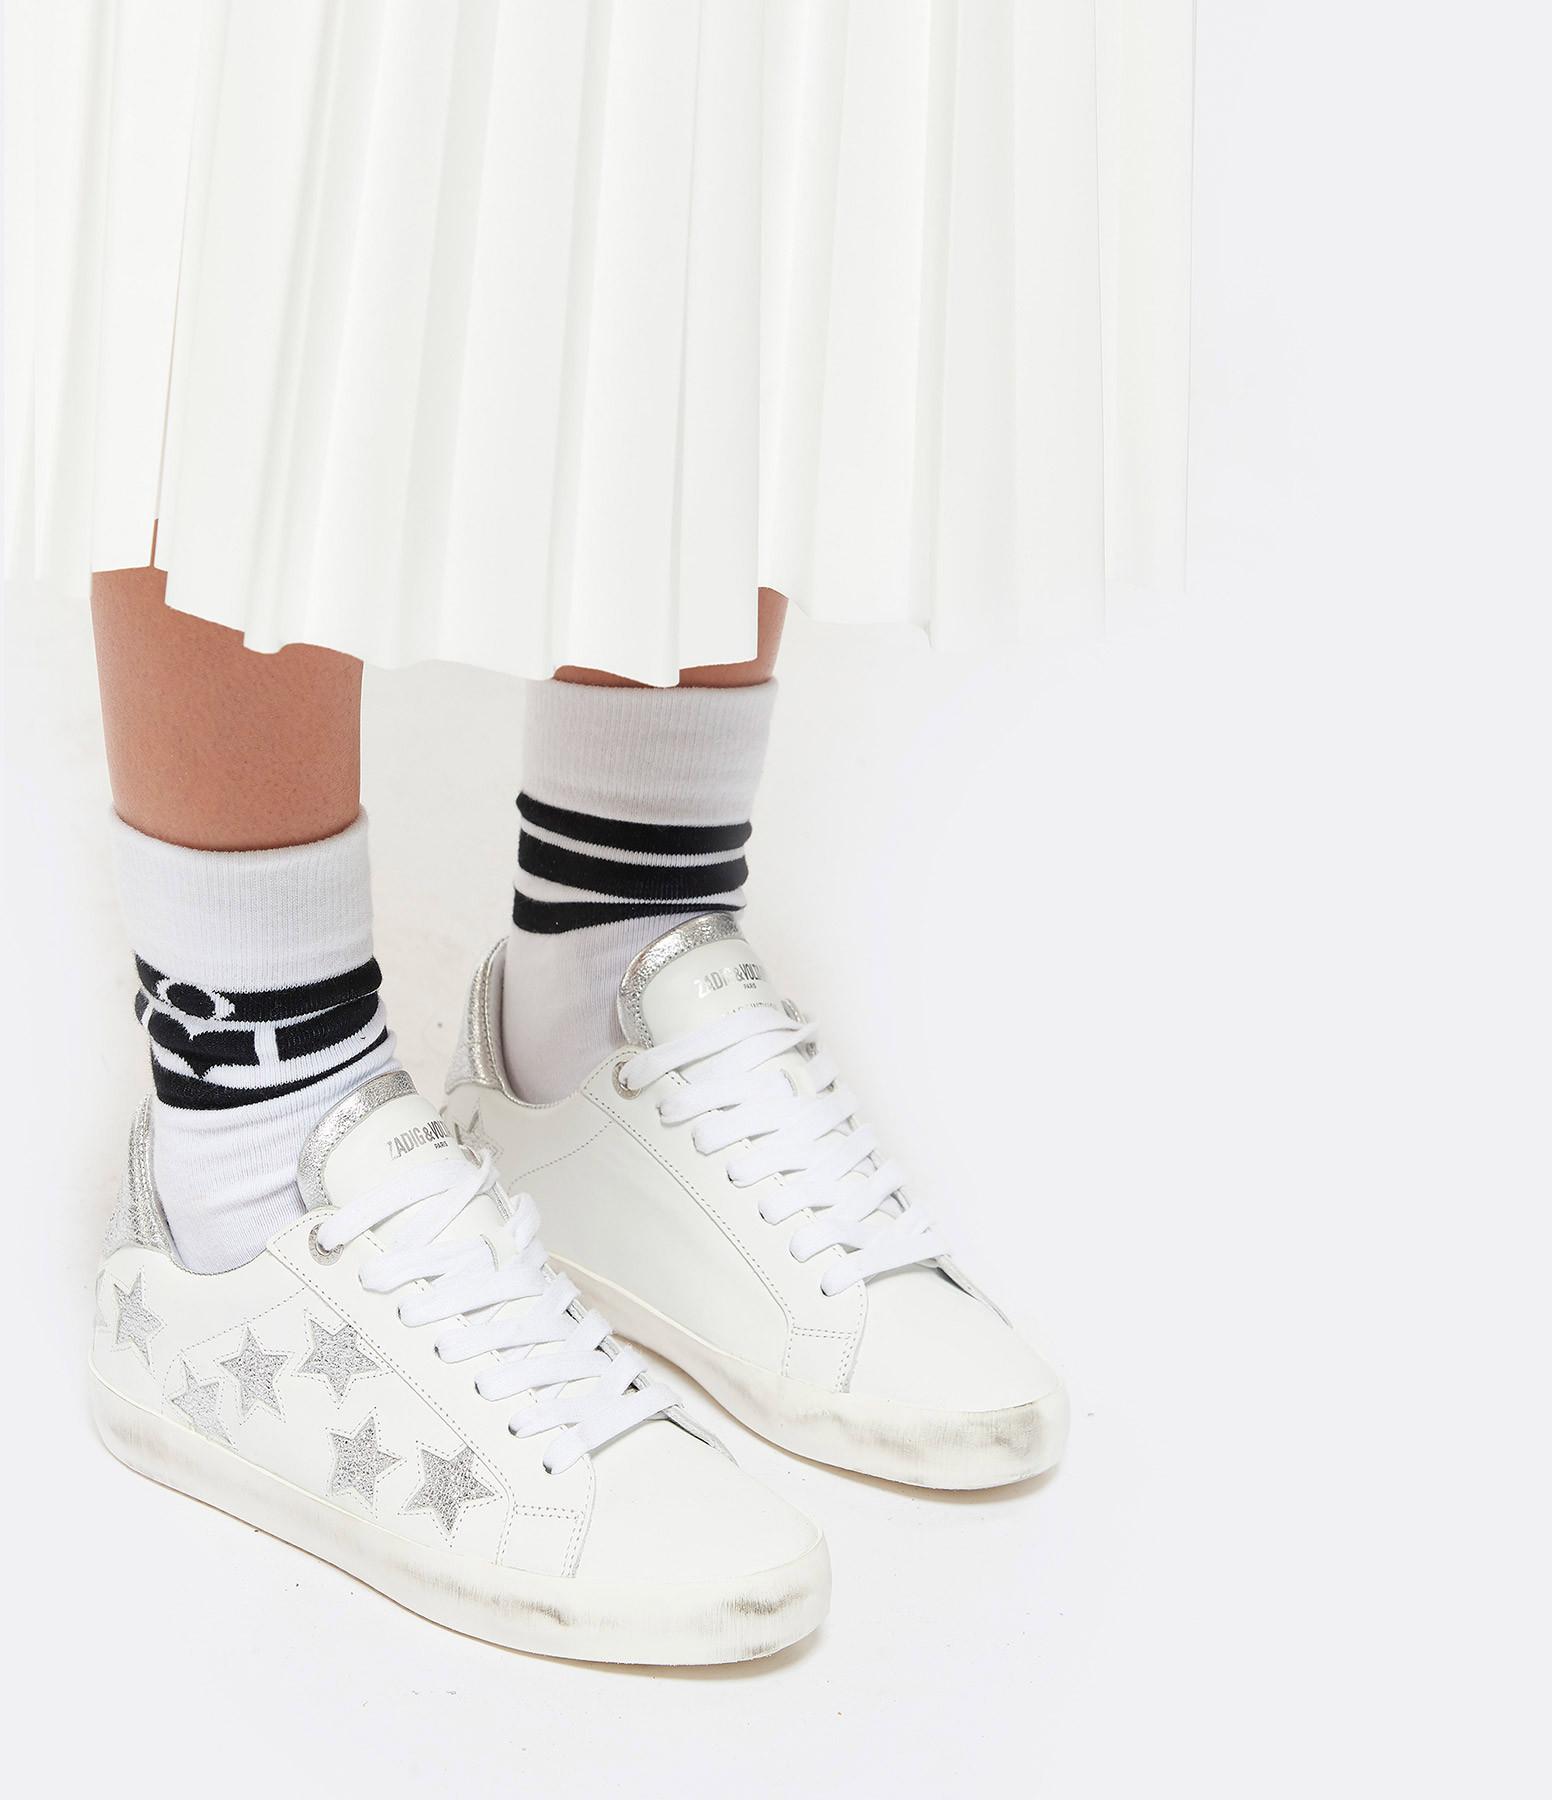 ZADIG & VOLTAIRE - Baskets Zadig Used Etoile Cuir Blanc